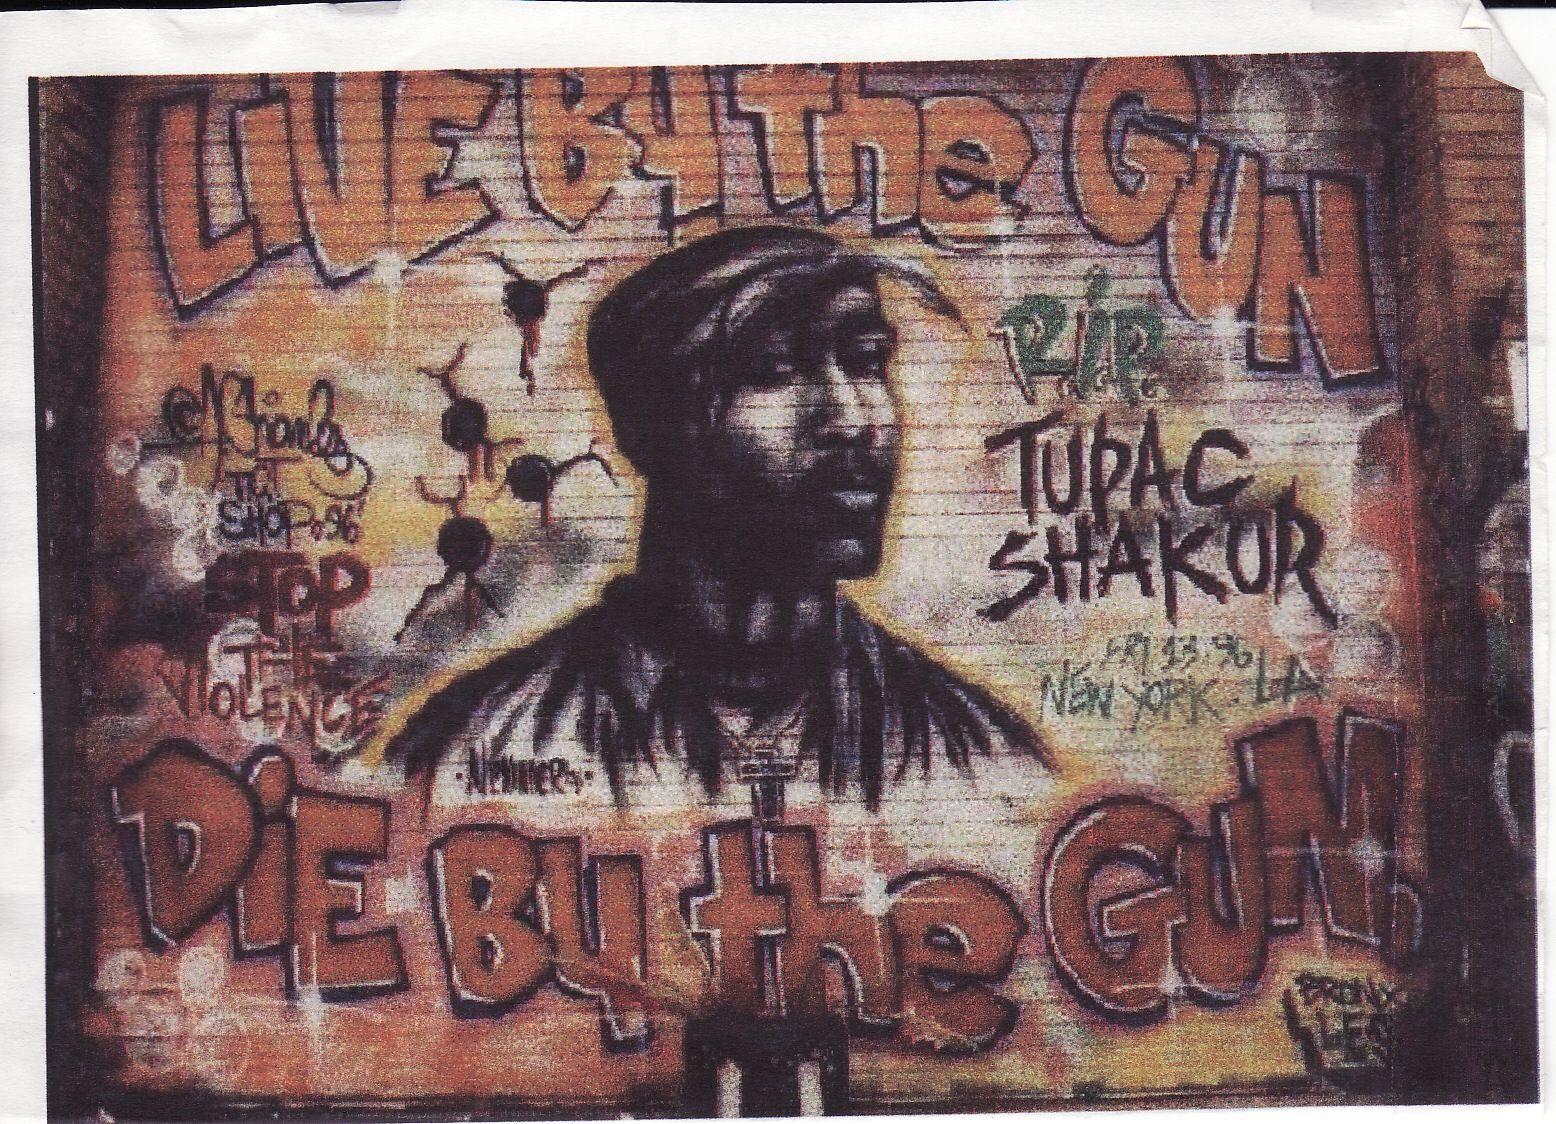 tupac mural art music pinterest mural art street tupac 2pac rap hip hop poster wall mural print on paper